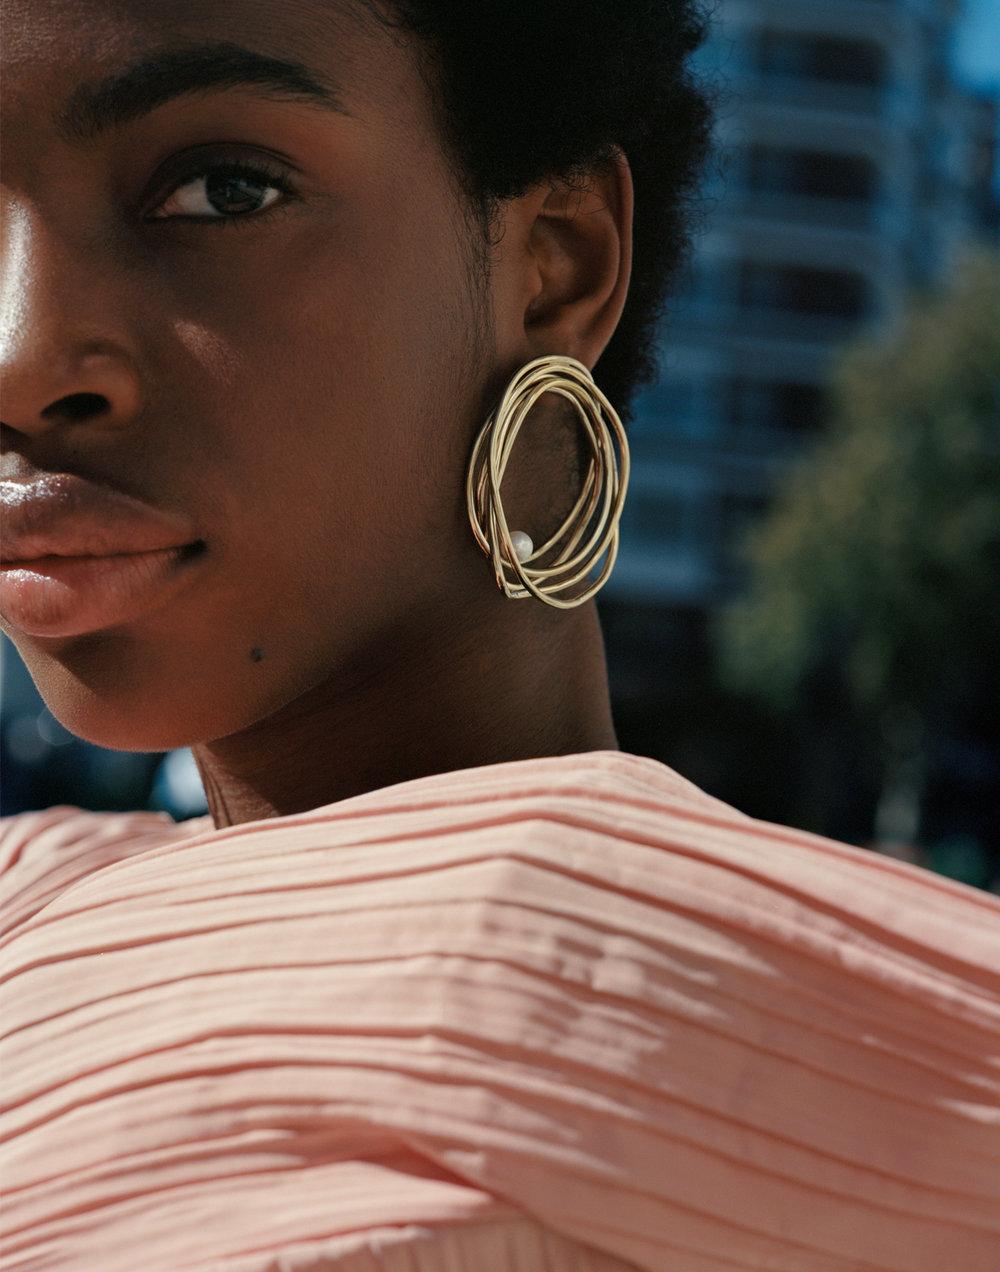 Completedworks-Fluid-Earrings-with-Peals-11.jpg